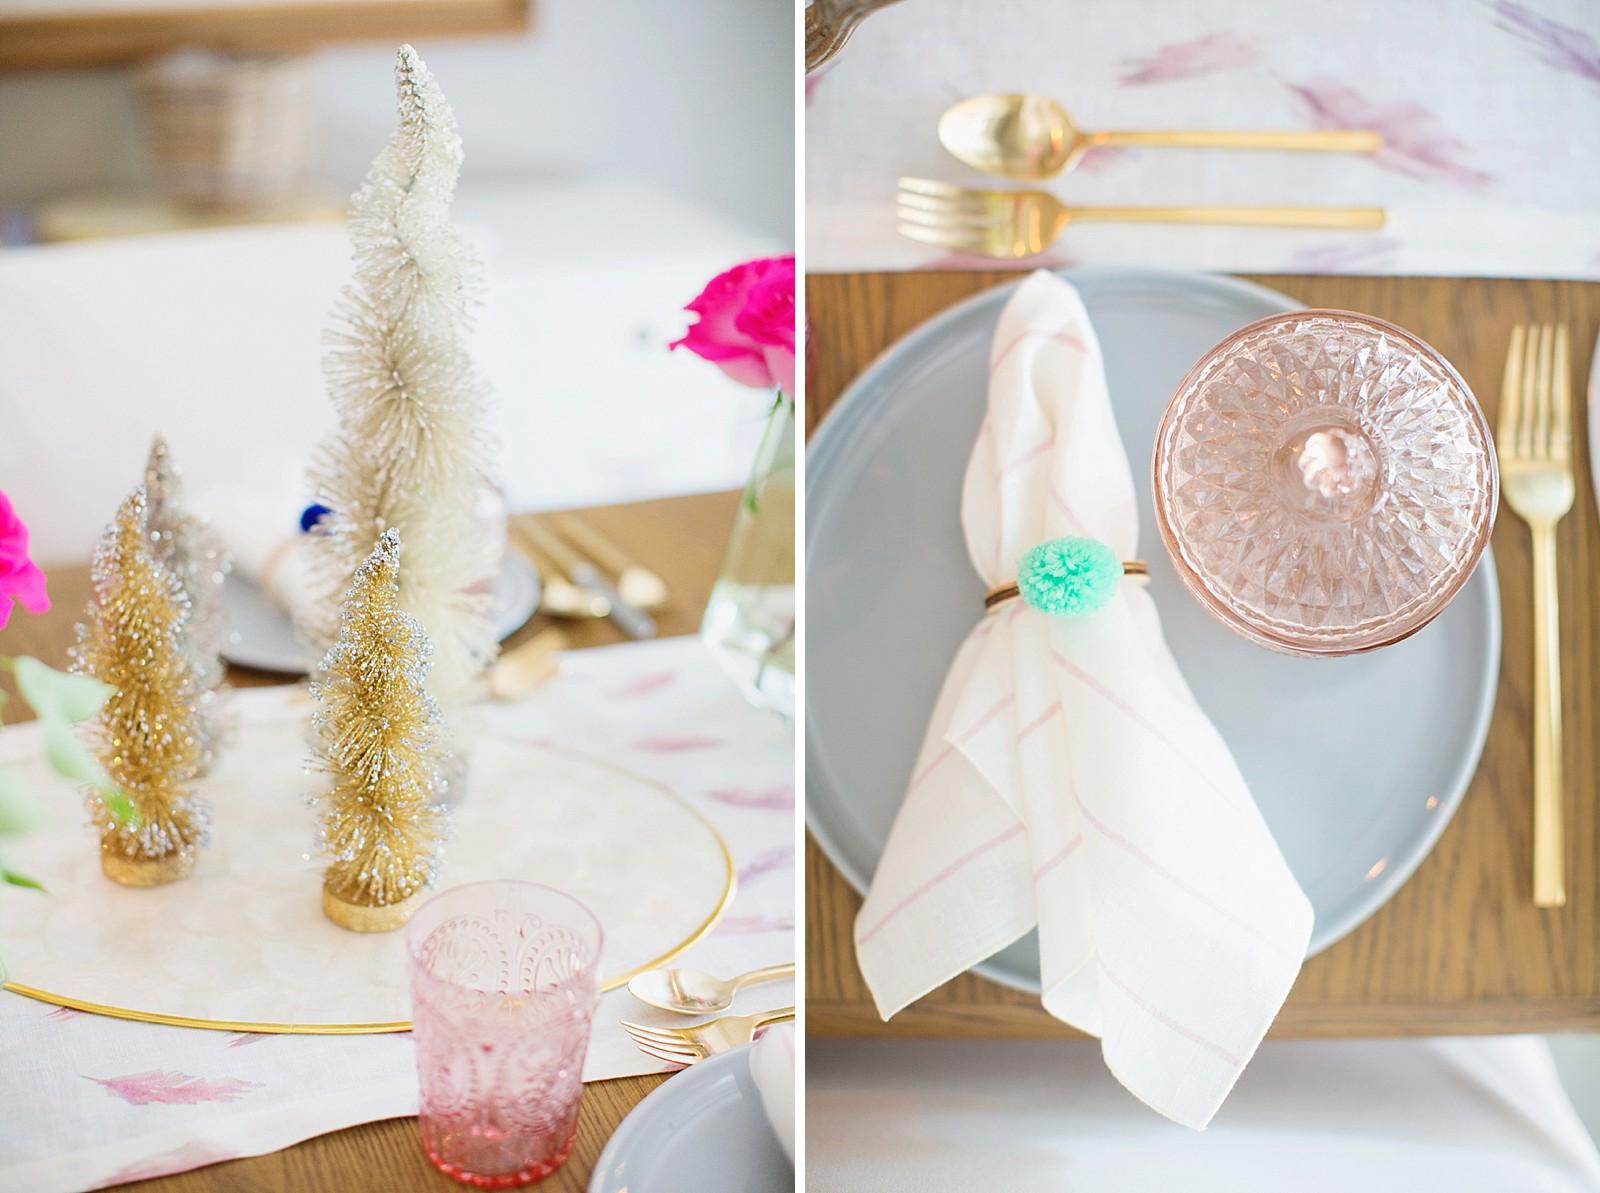 minted-christmas-inspiration-girls-party-photos-diana-elizabeth-blog-lifestyle-hostess-entertainment-home-blog-2244